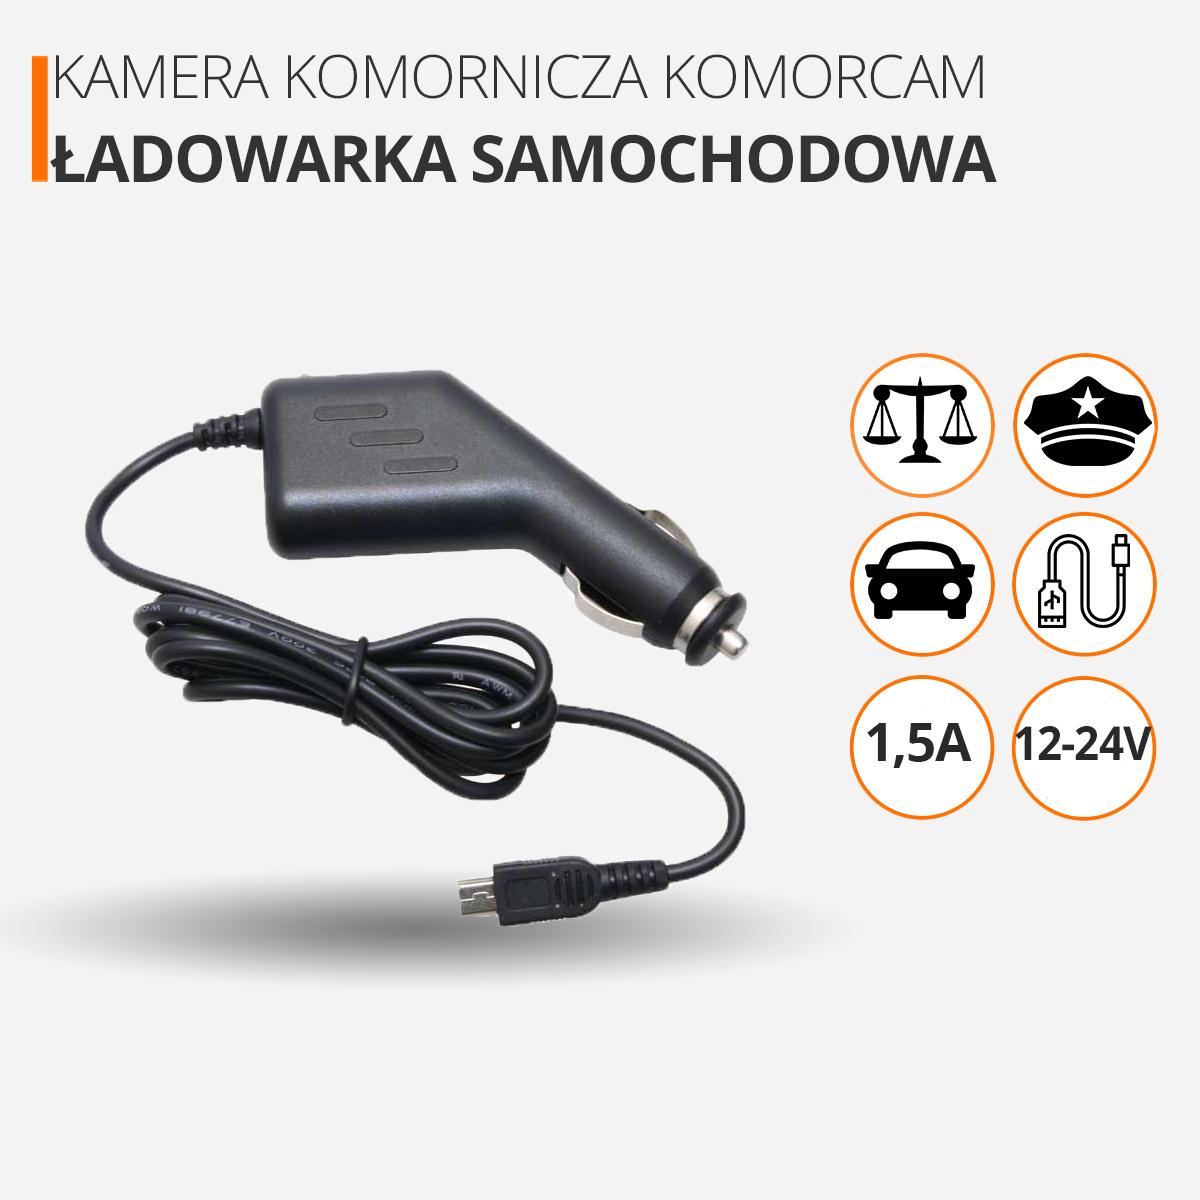 Kamera nasobna komornicza dla policjanta orllo.pl